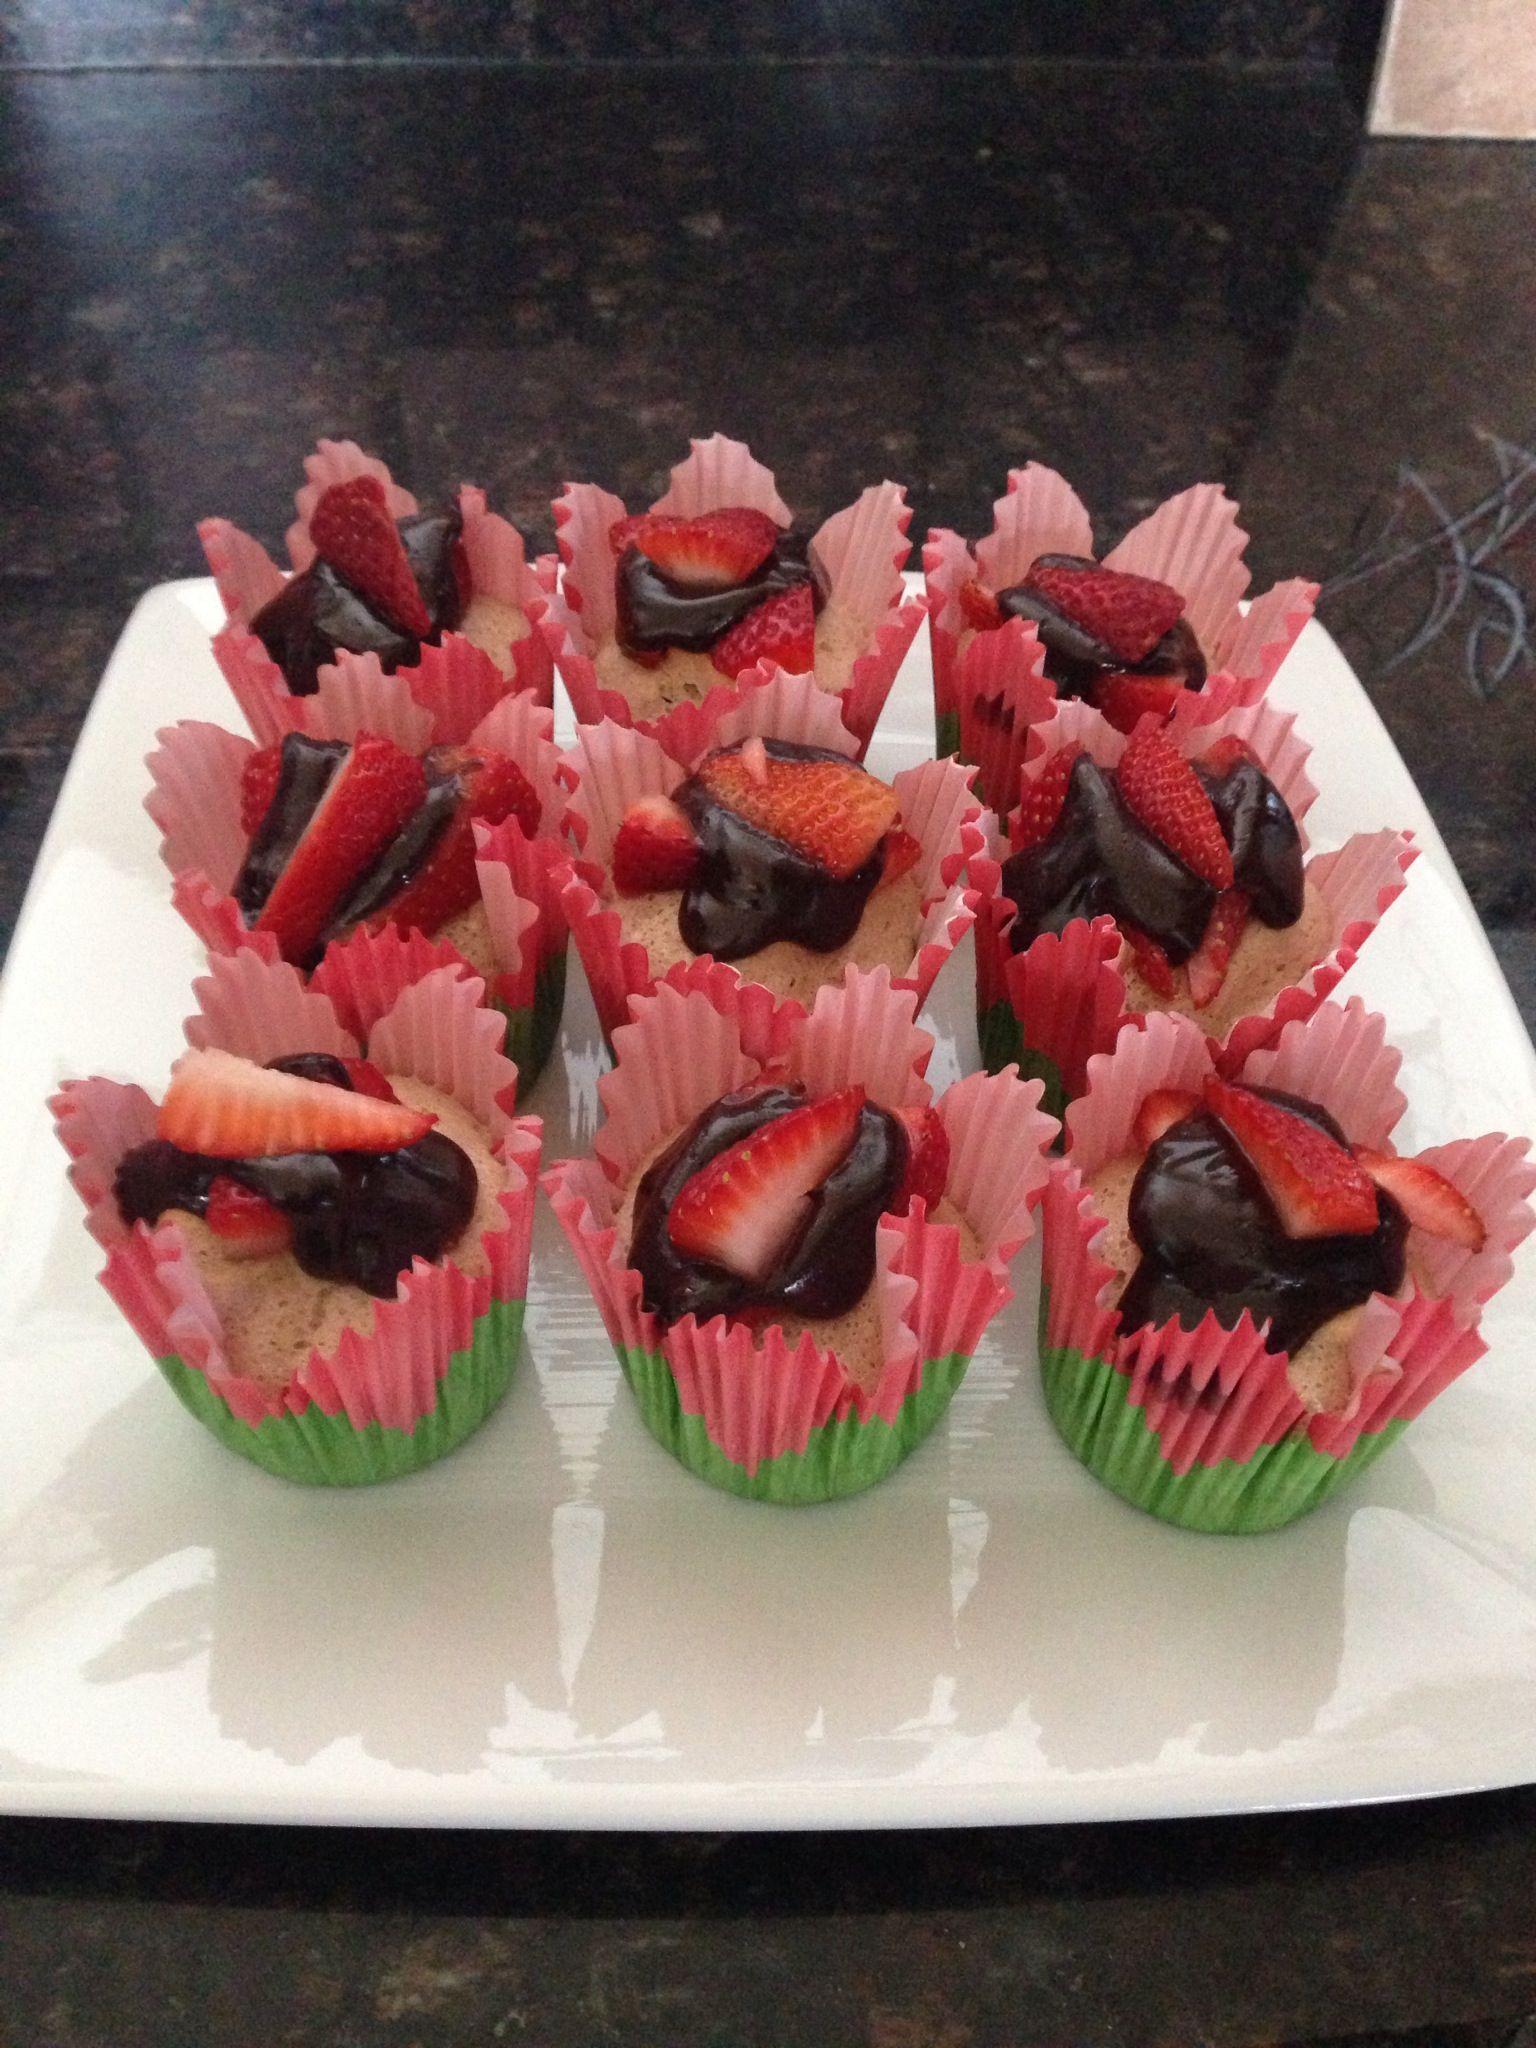 Strawberry chocolate angel cupcake